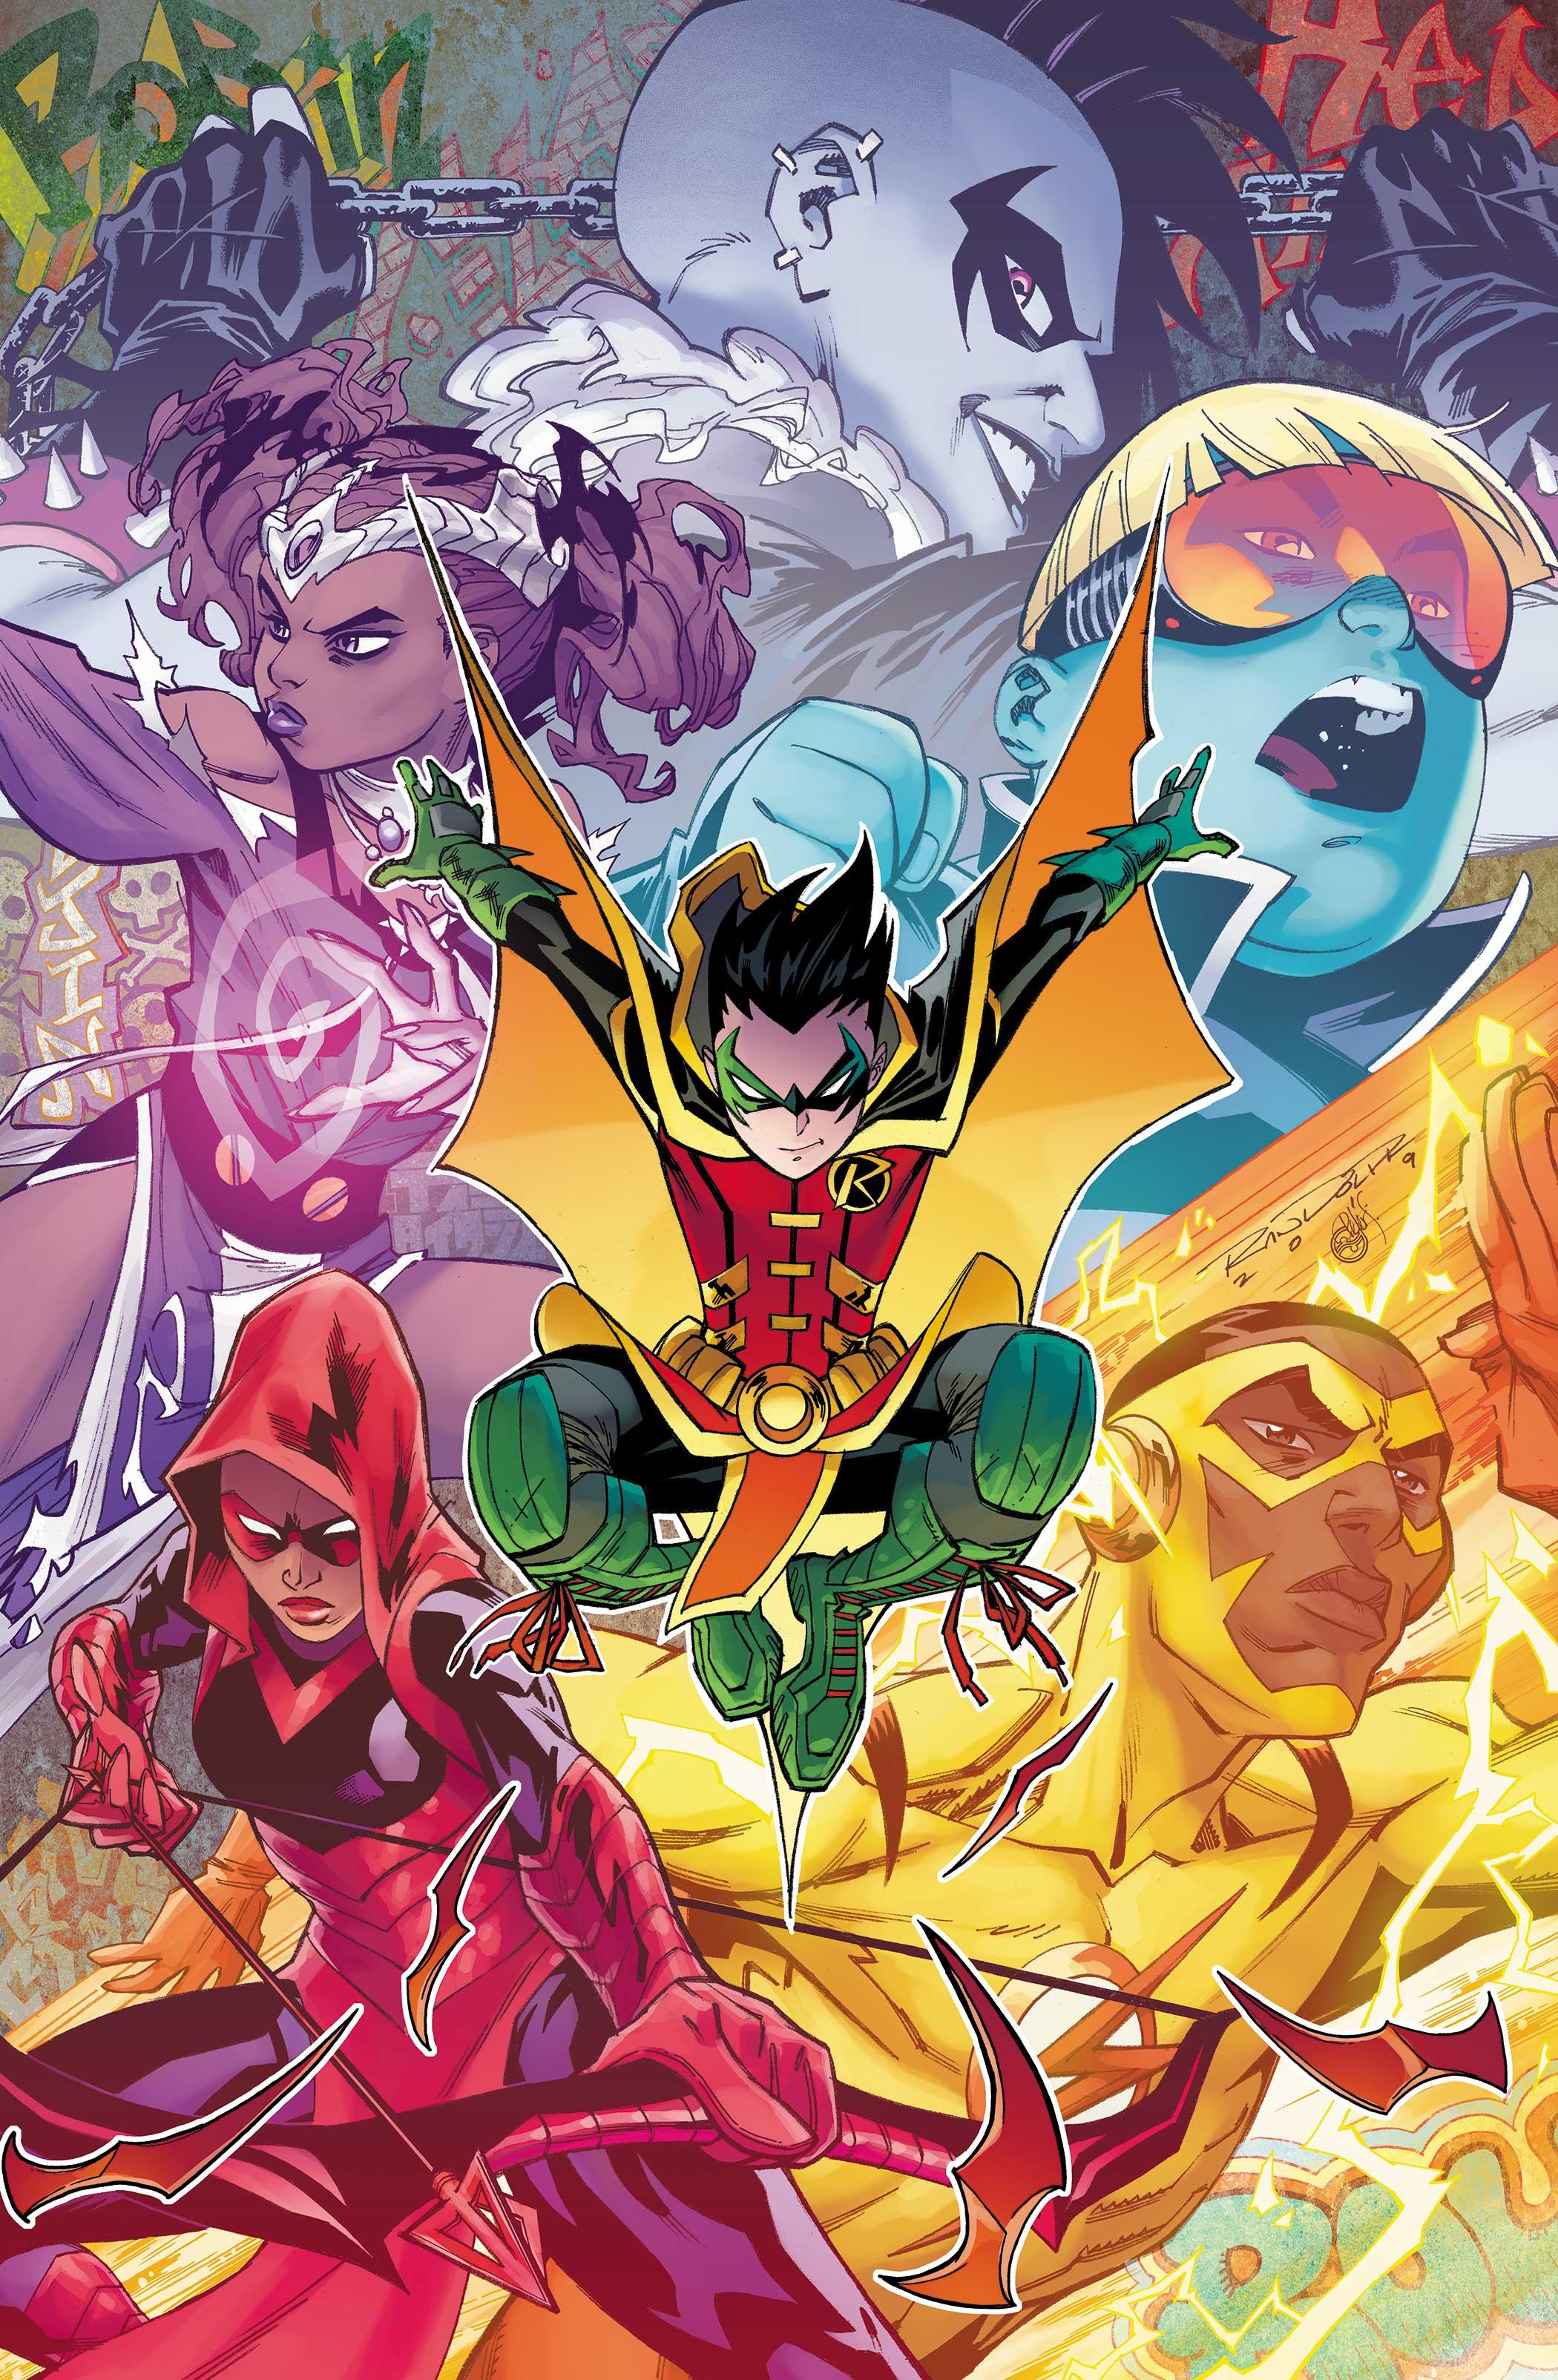 Teen Titans Vol 6 37 Textless Variant.jpg